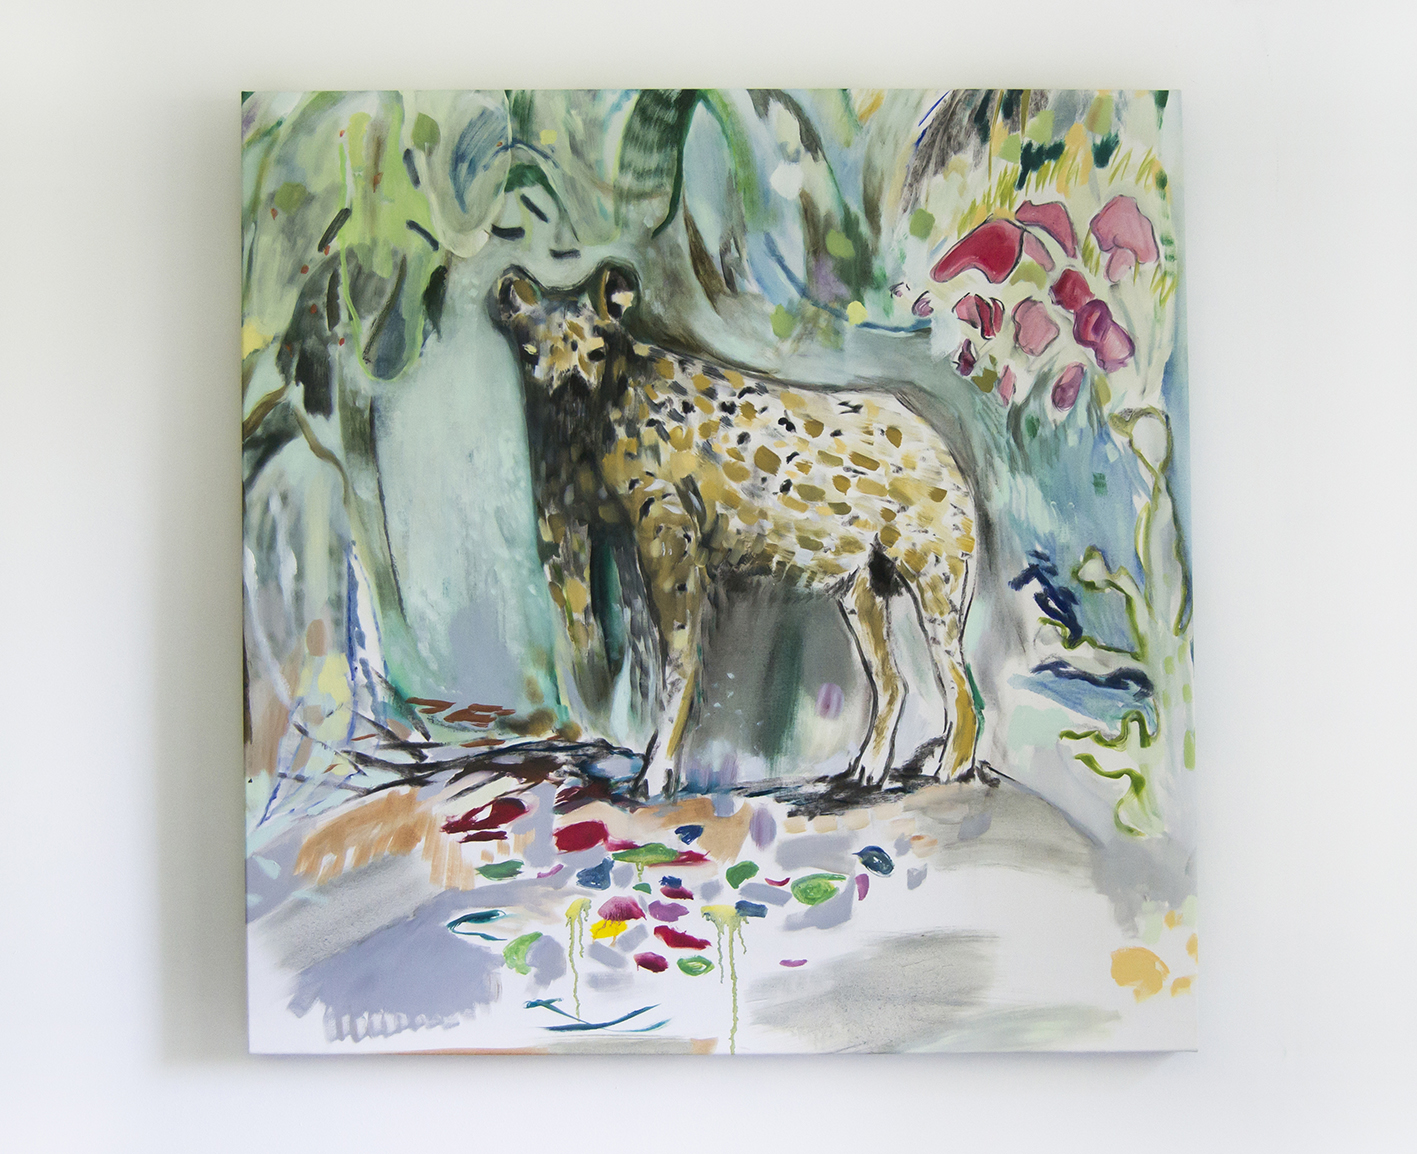 Vera Portatadino, Untitled Hyena, 2015, olio su tela, 120x120 cm.